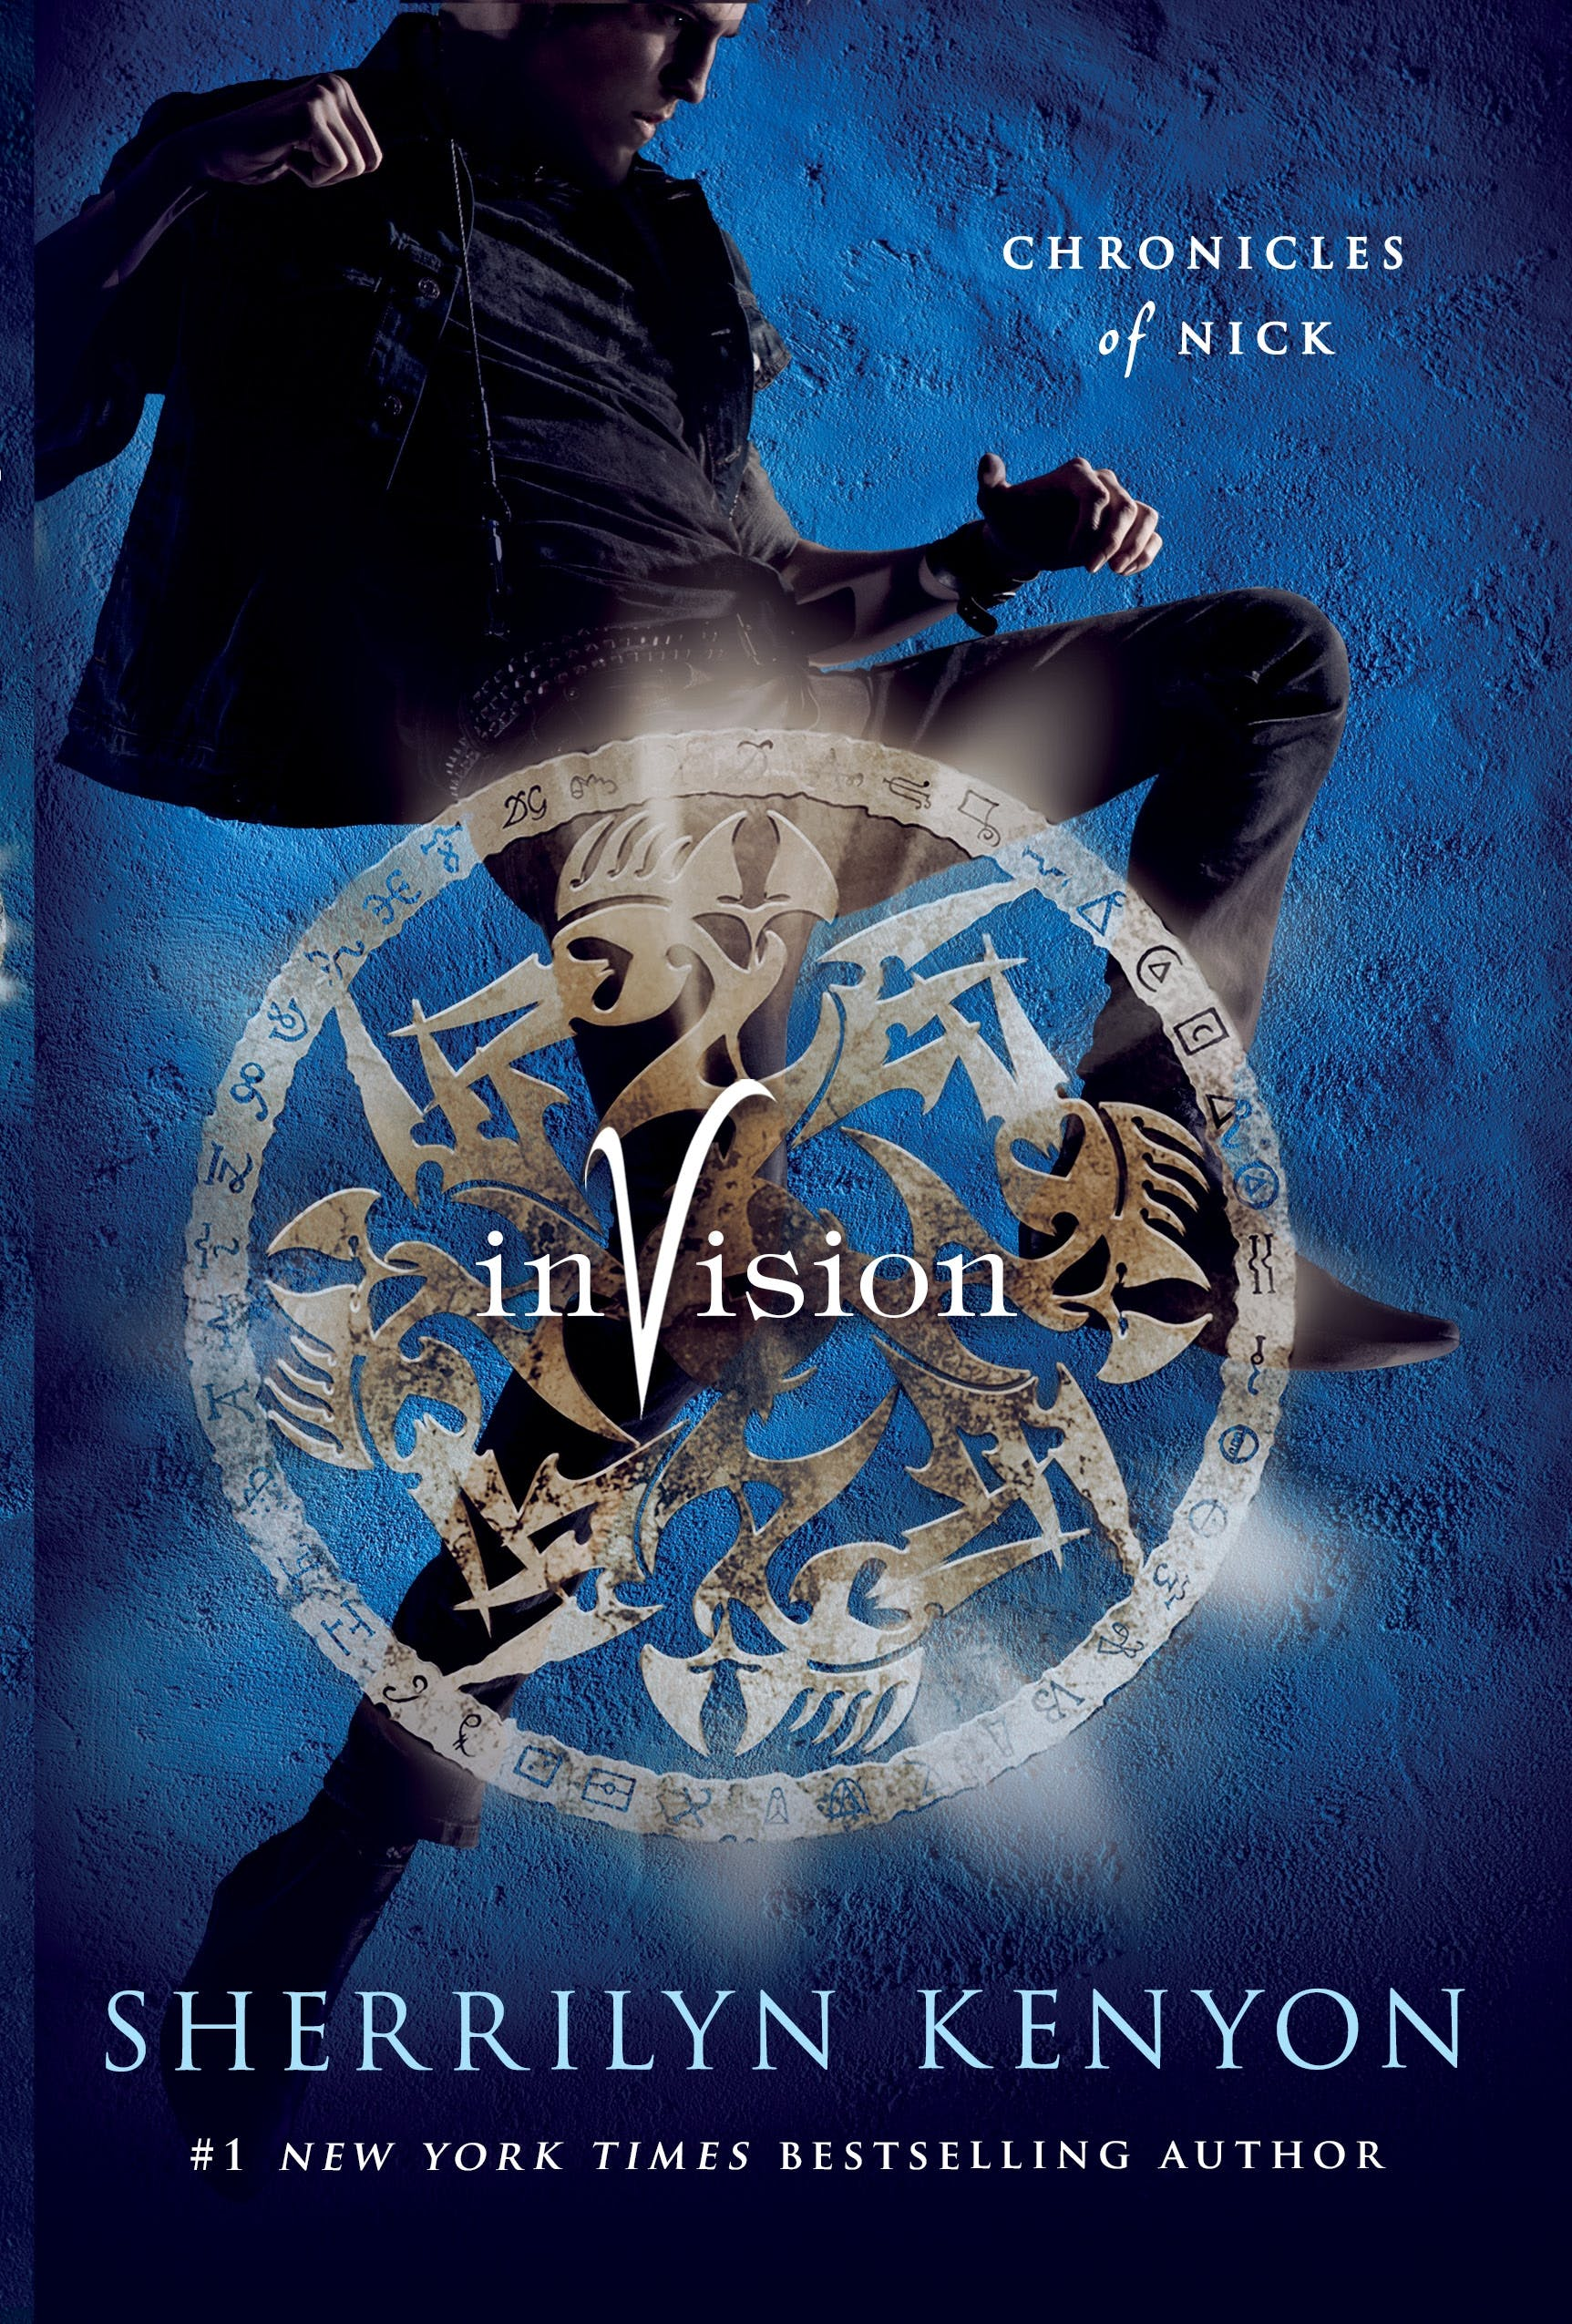 Image of Invision